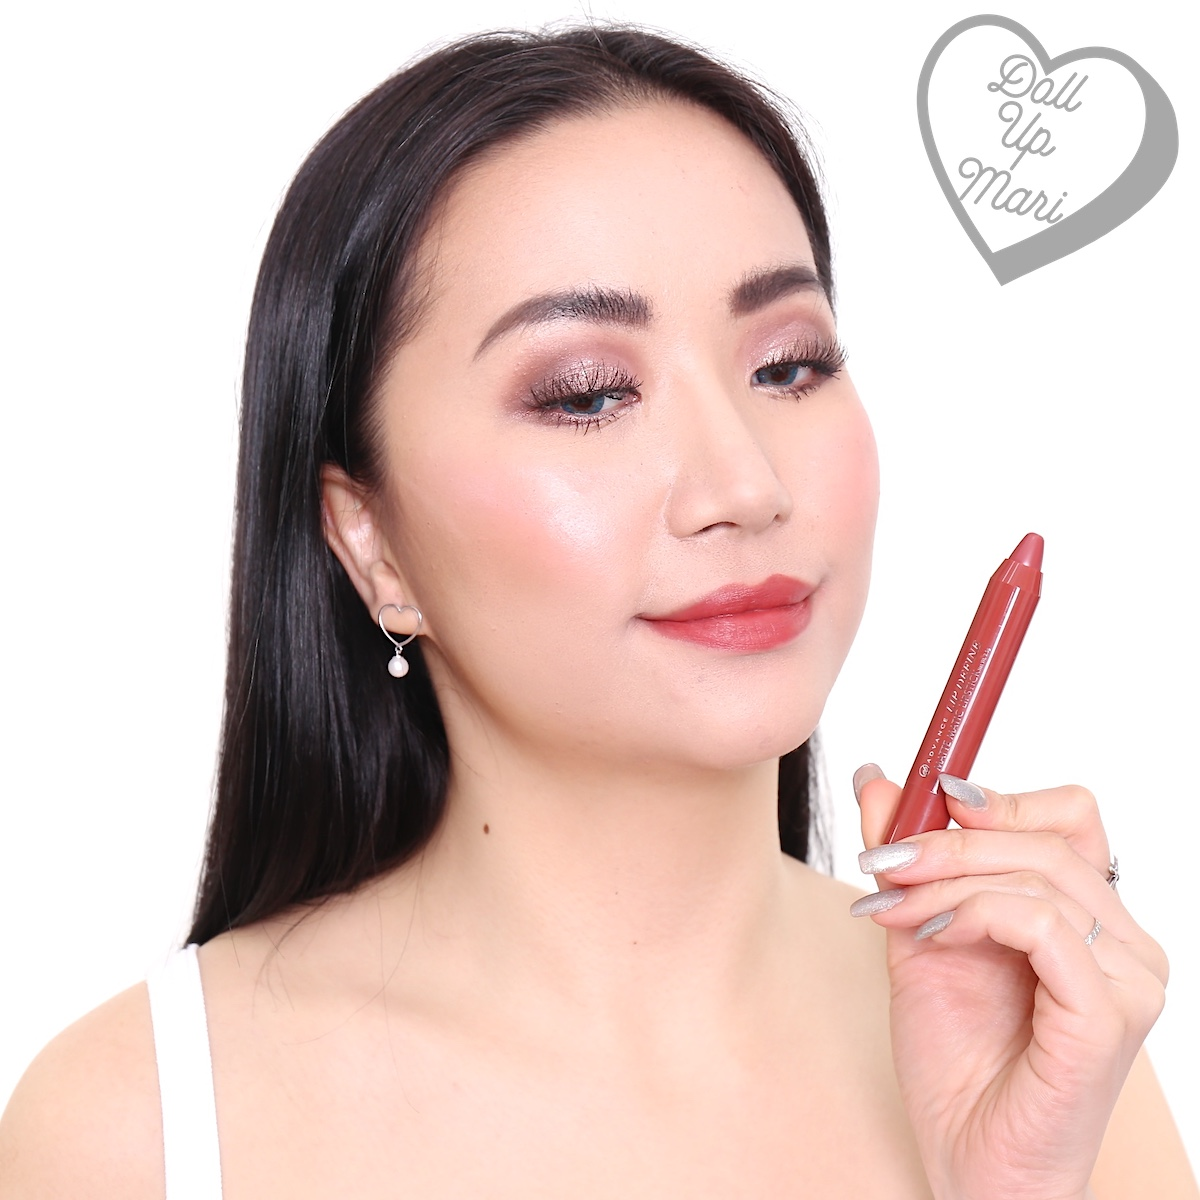 EB Advance Lip Define Matte Matic Lipstick Review and Swatches